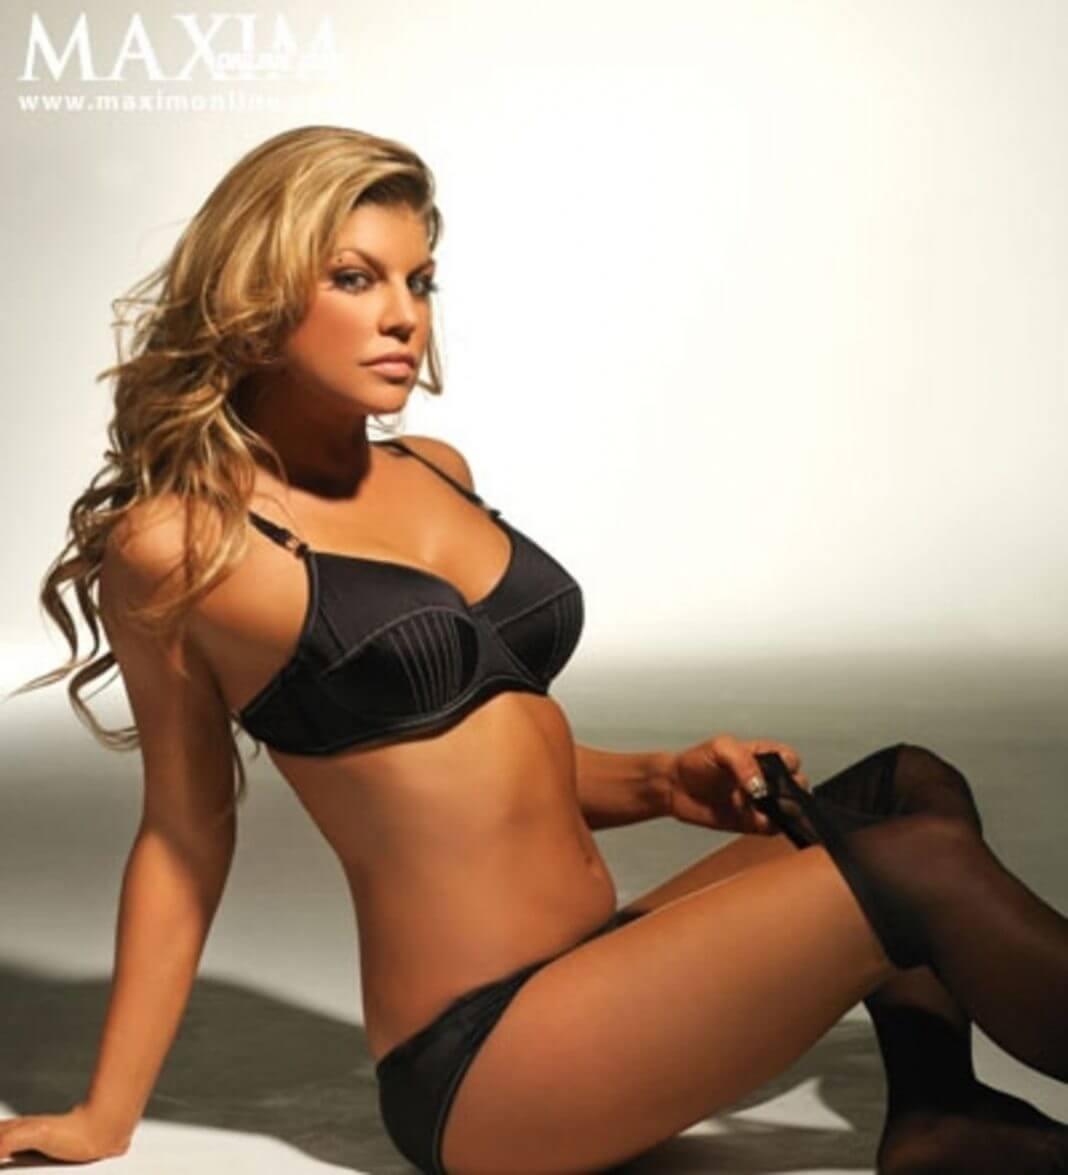 Fergie hot look pics